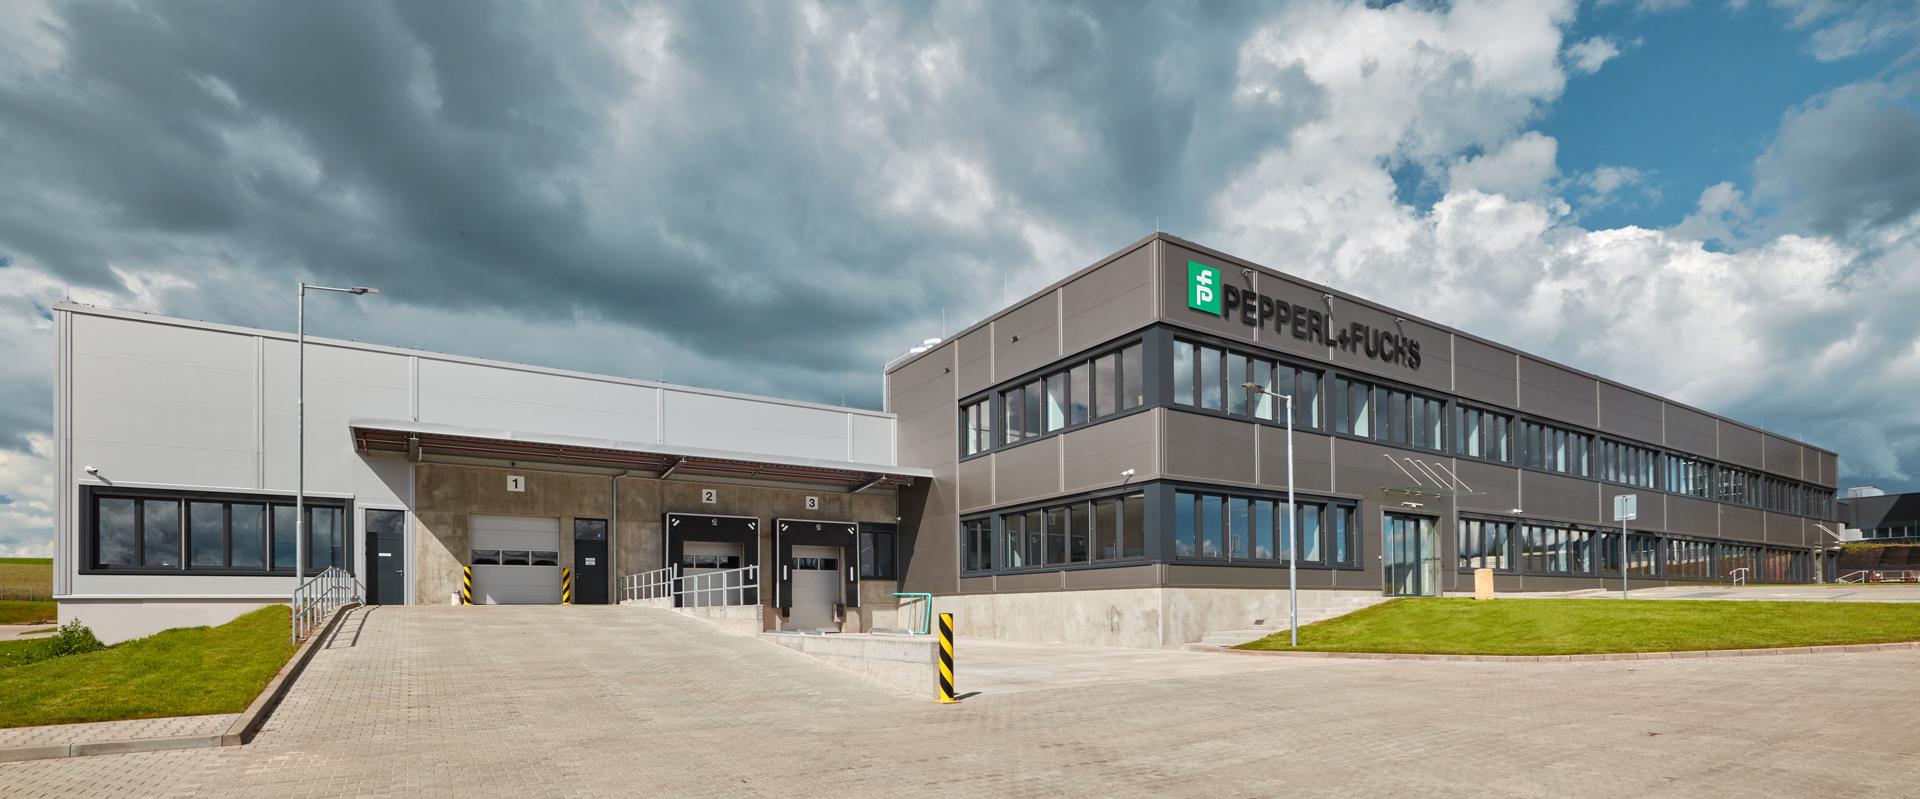 Pepperl+Fuchs plant Trutnov, Czech Republic